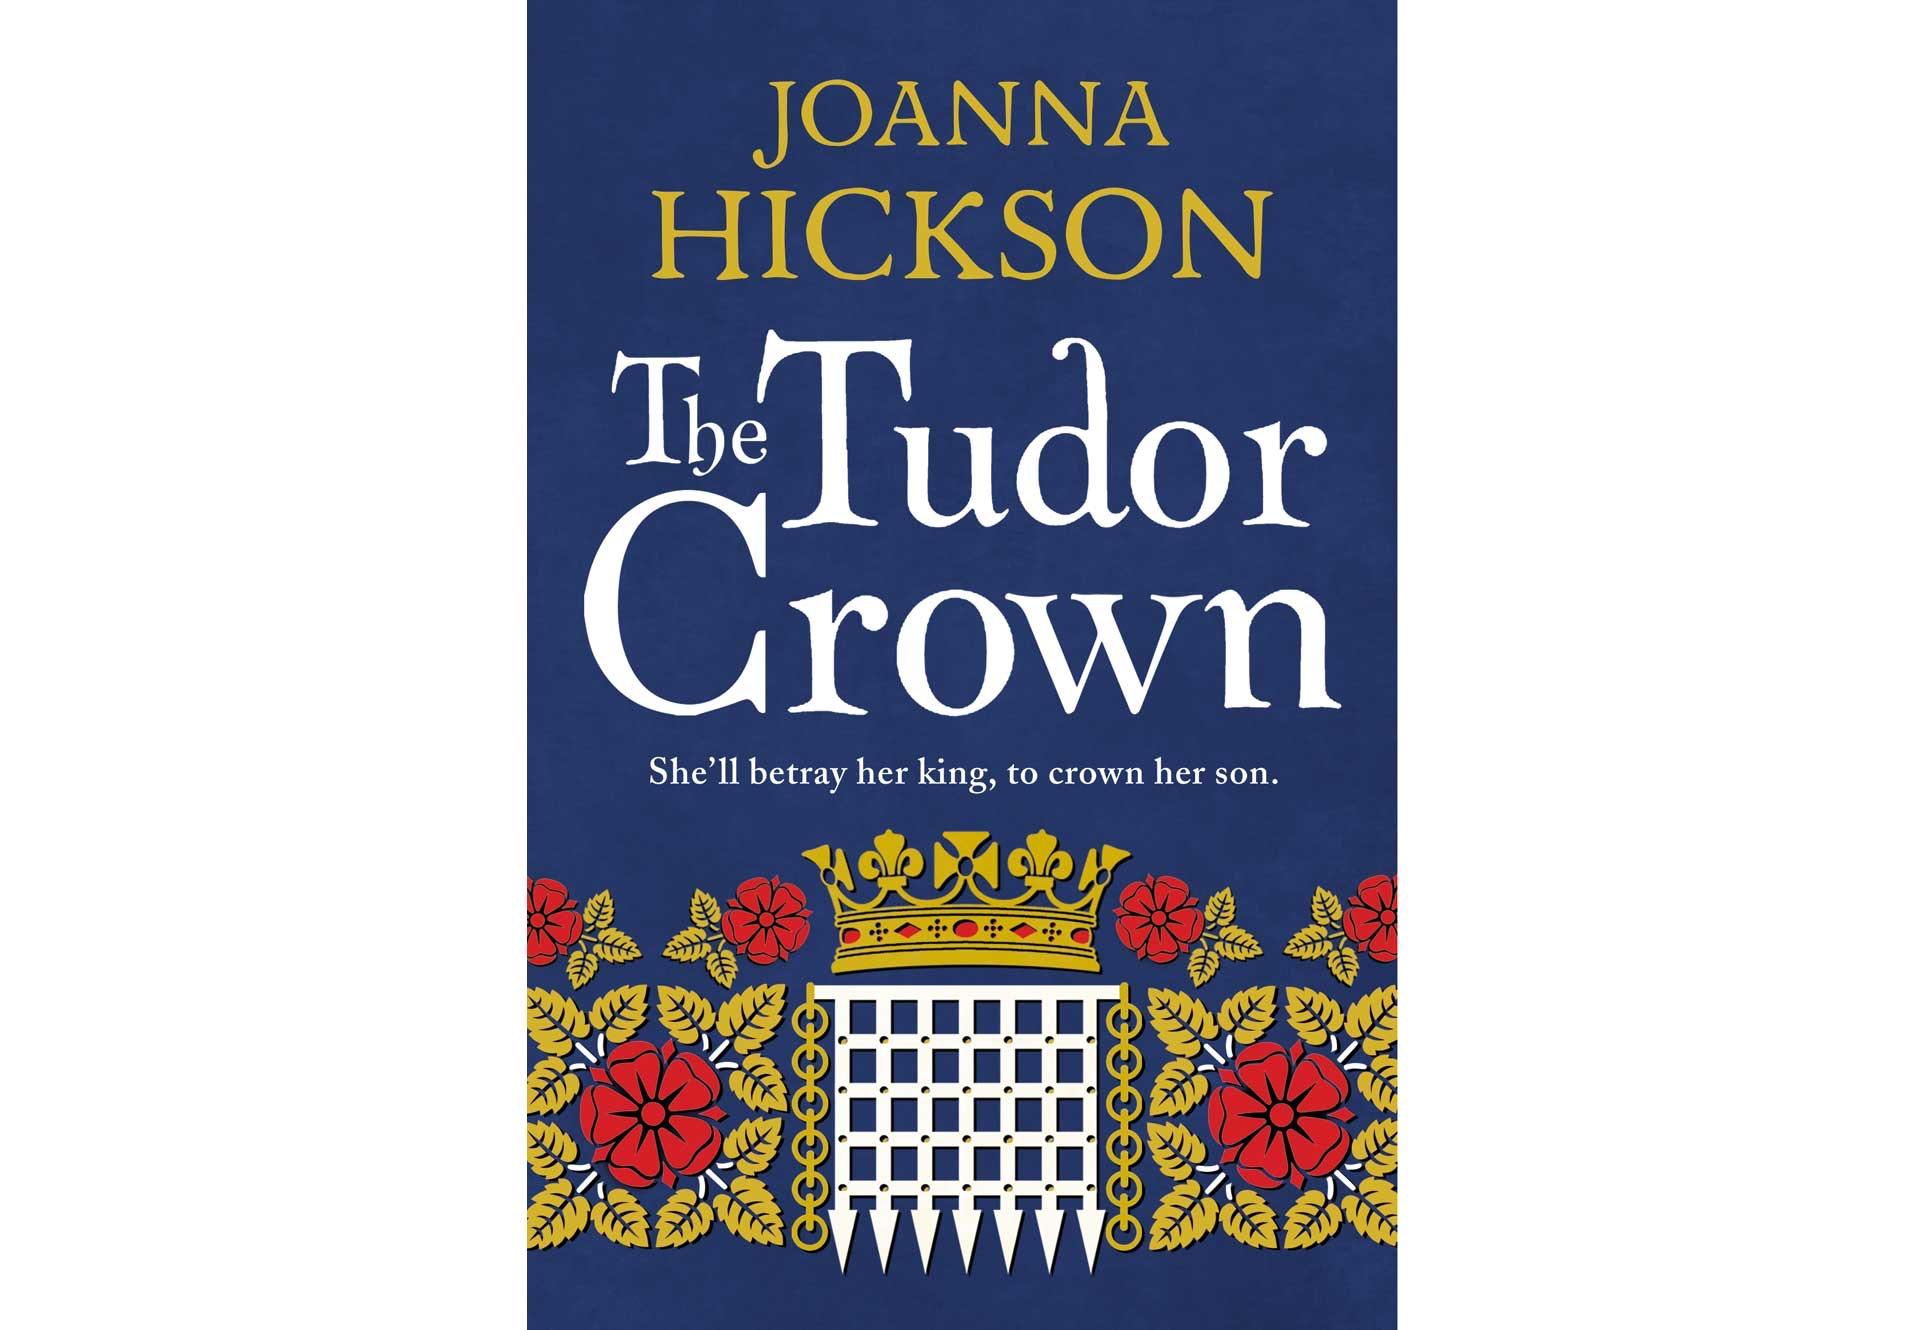 THE TUDOR CROWN BY JOANNA HICKSON  sweepstakes